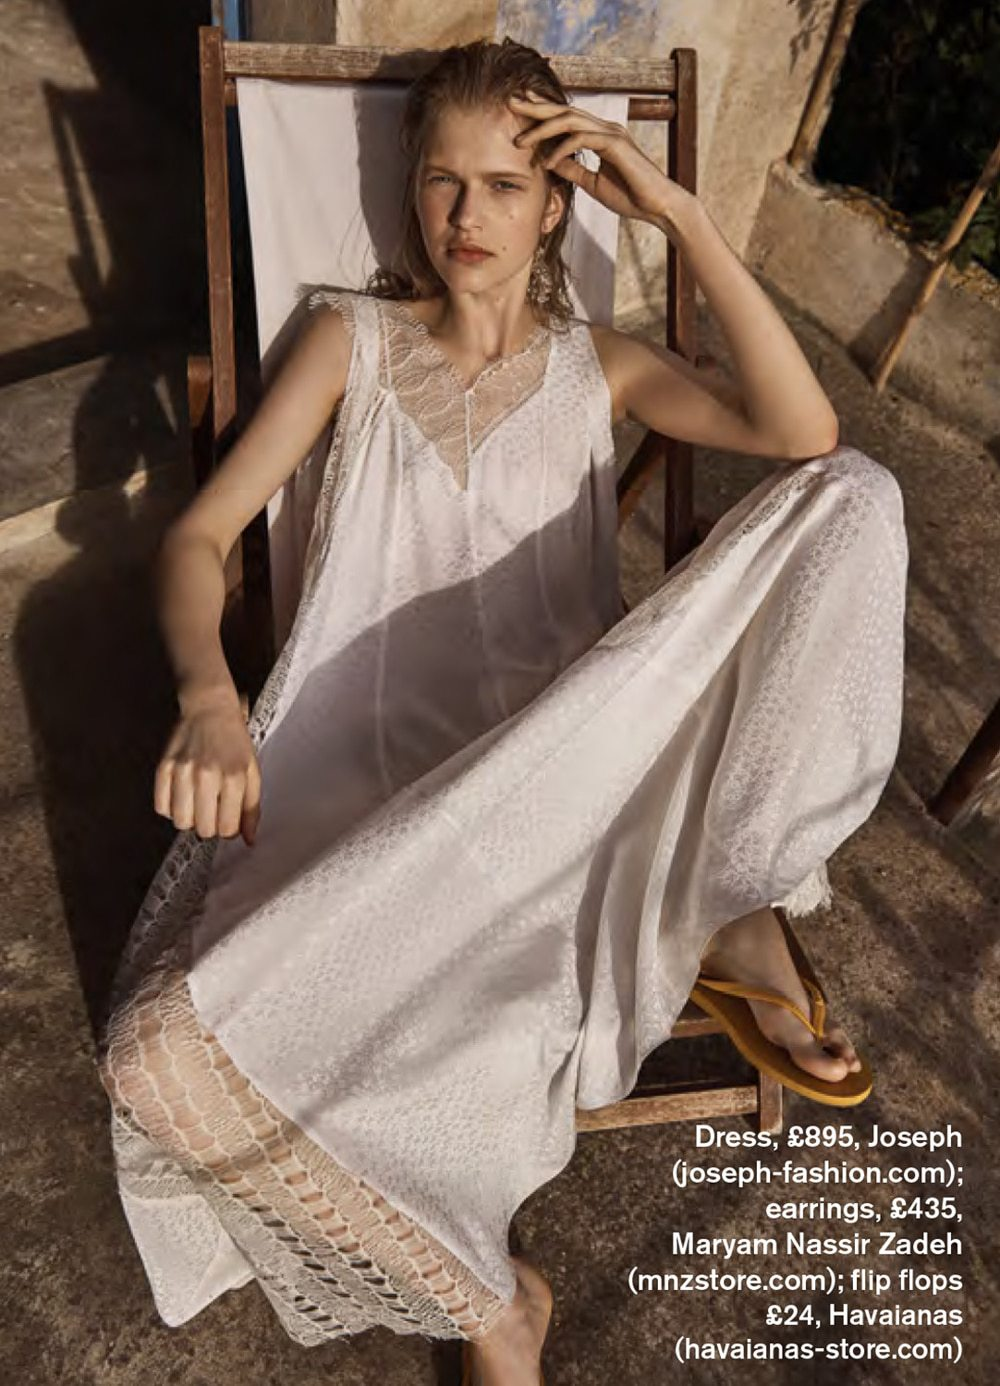 Aivita Muze by Bridget Fleming for Stylist Magazine June 2018